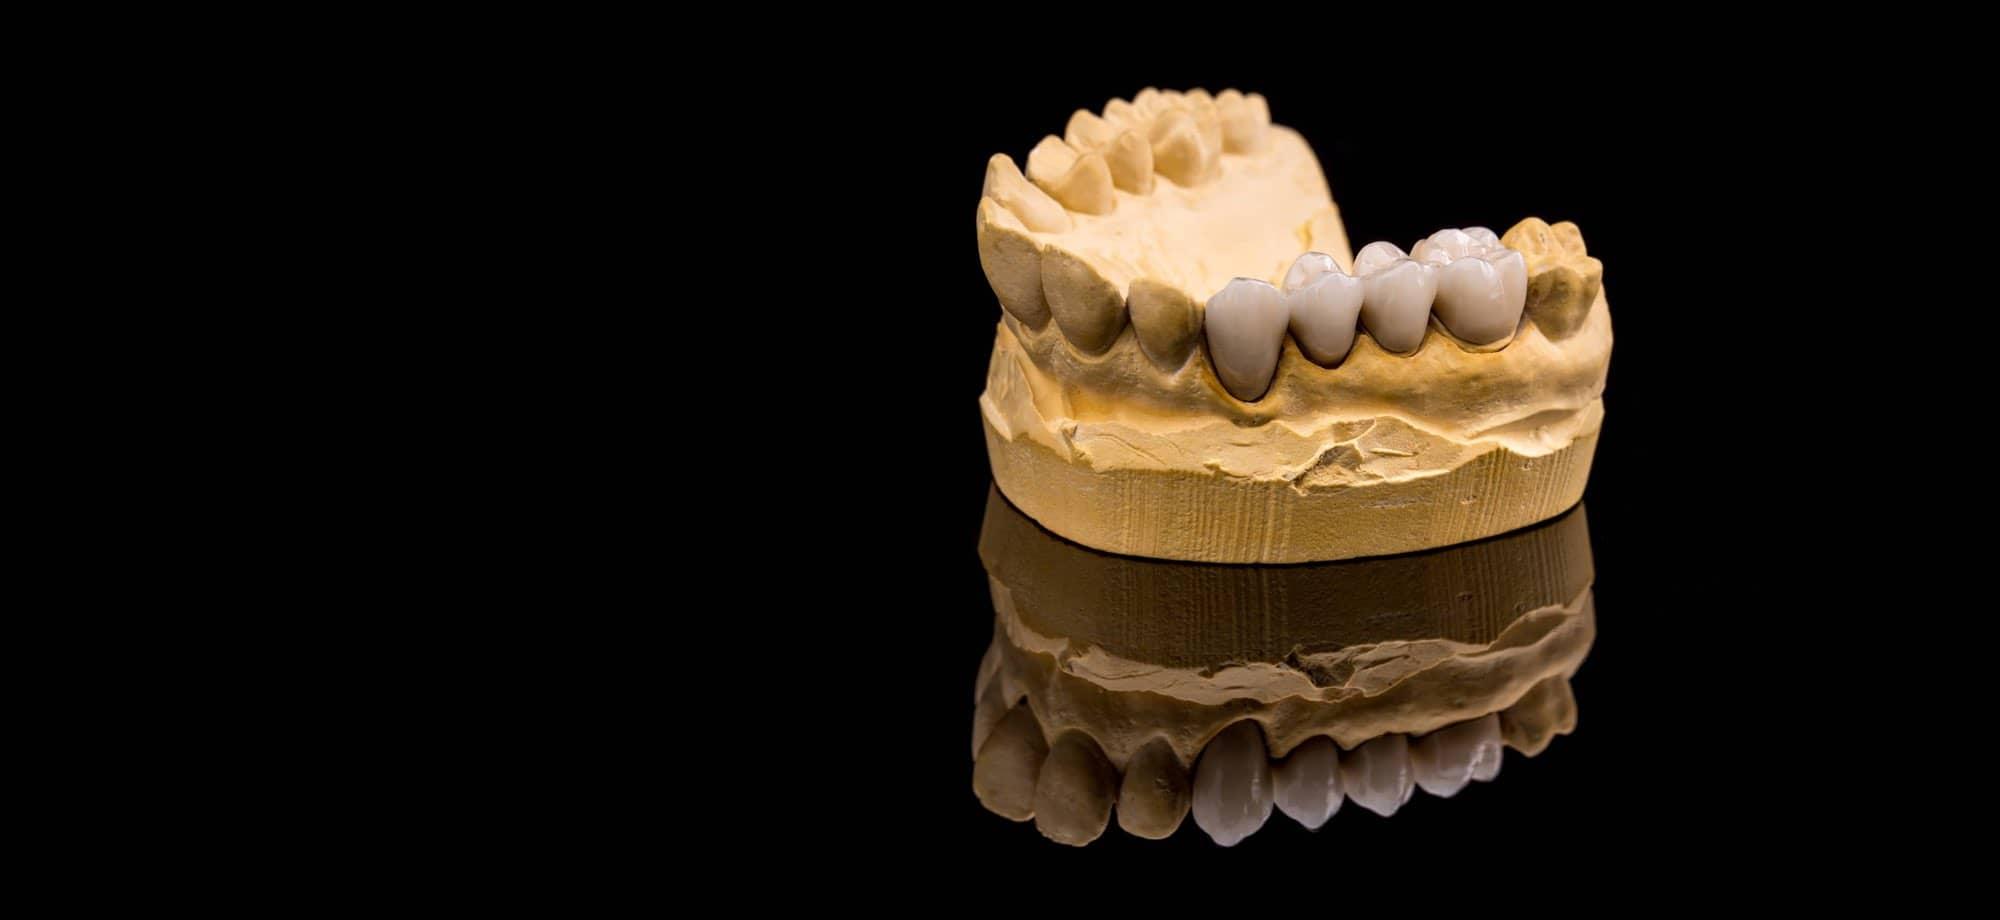 zubna celjust keramika konstrukcija@2x